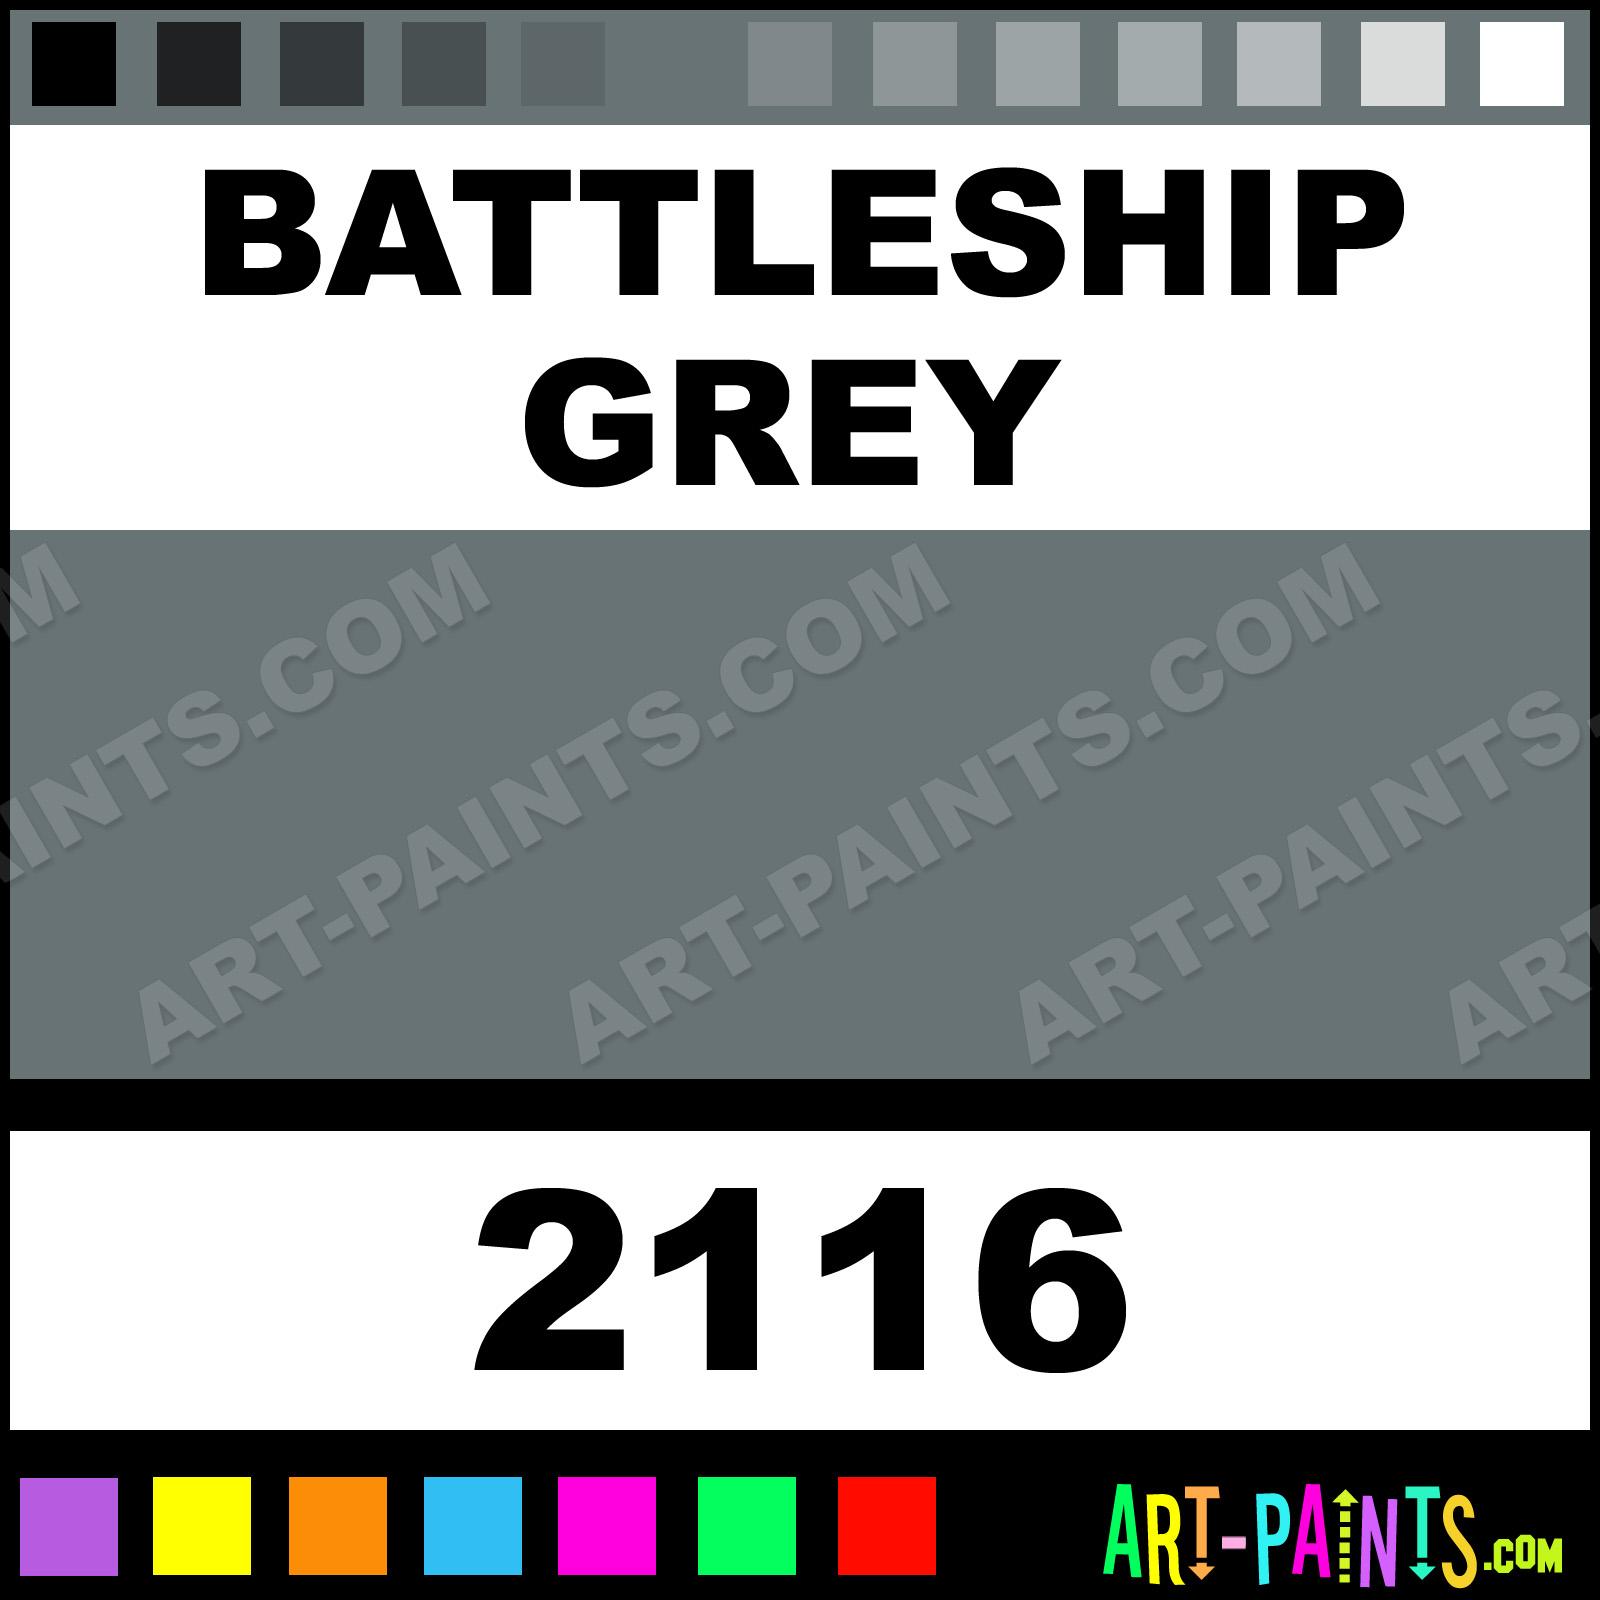 battleship grey - Battleship Grey Color